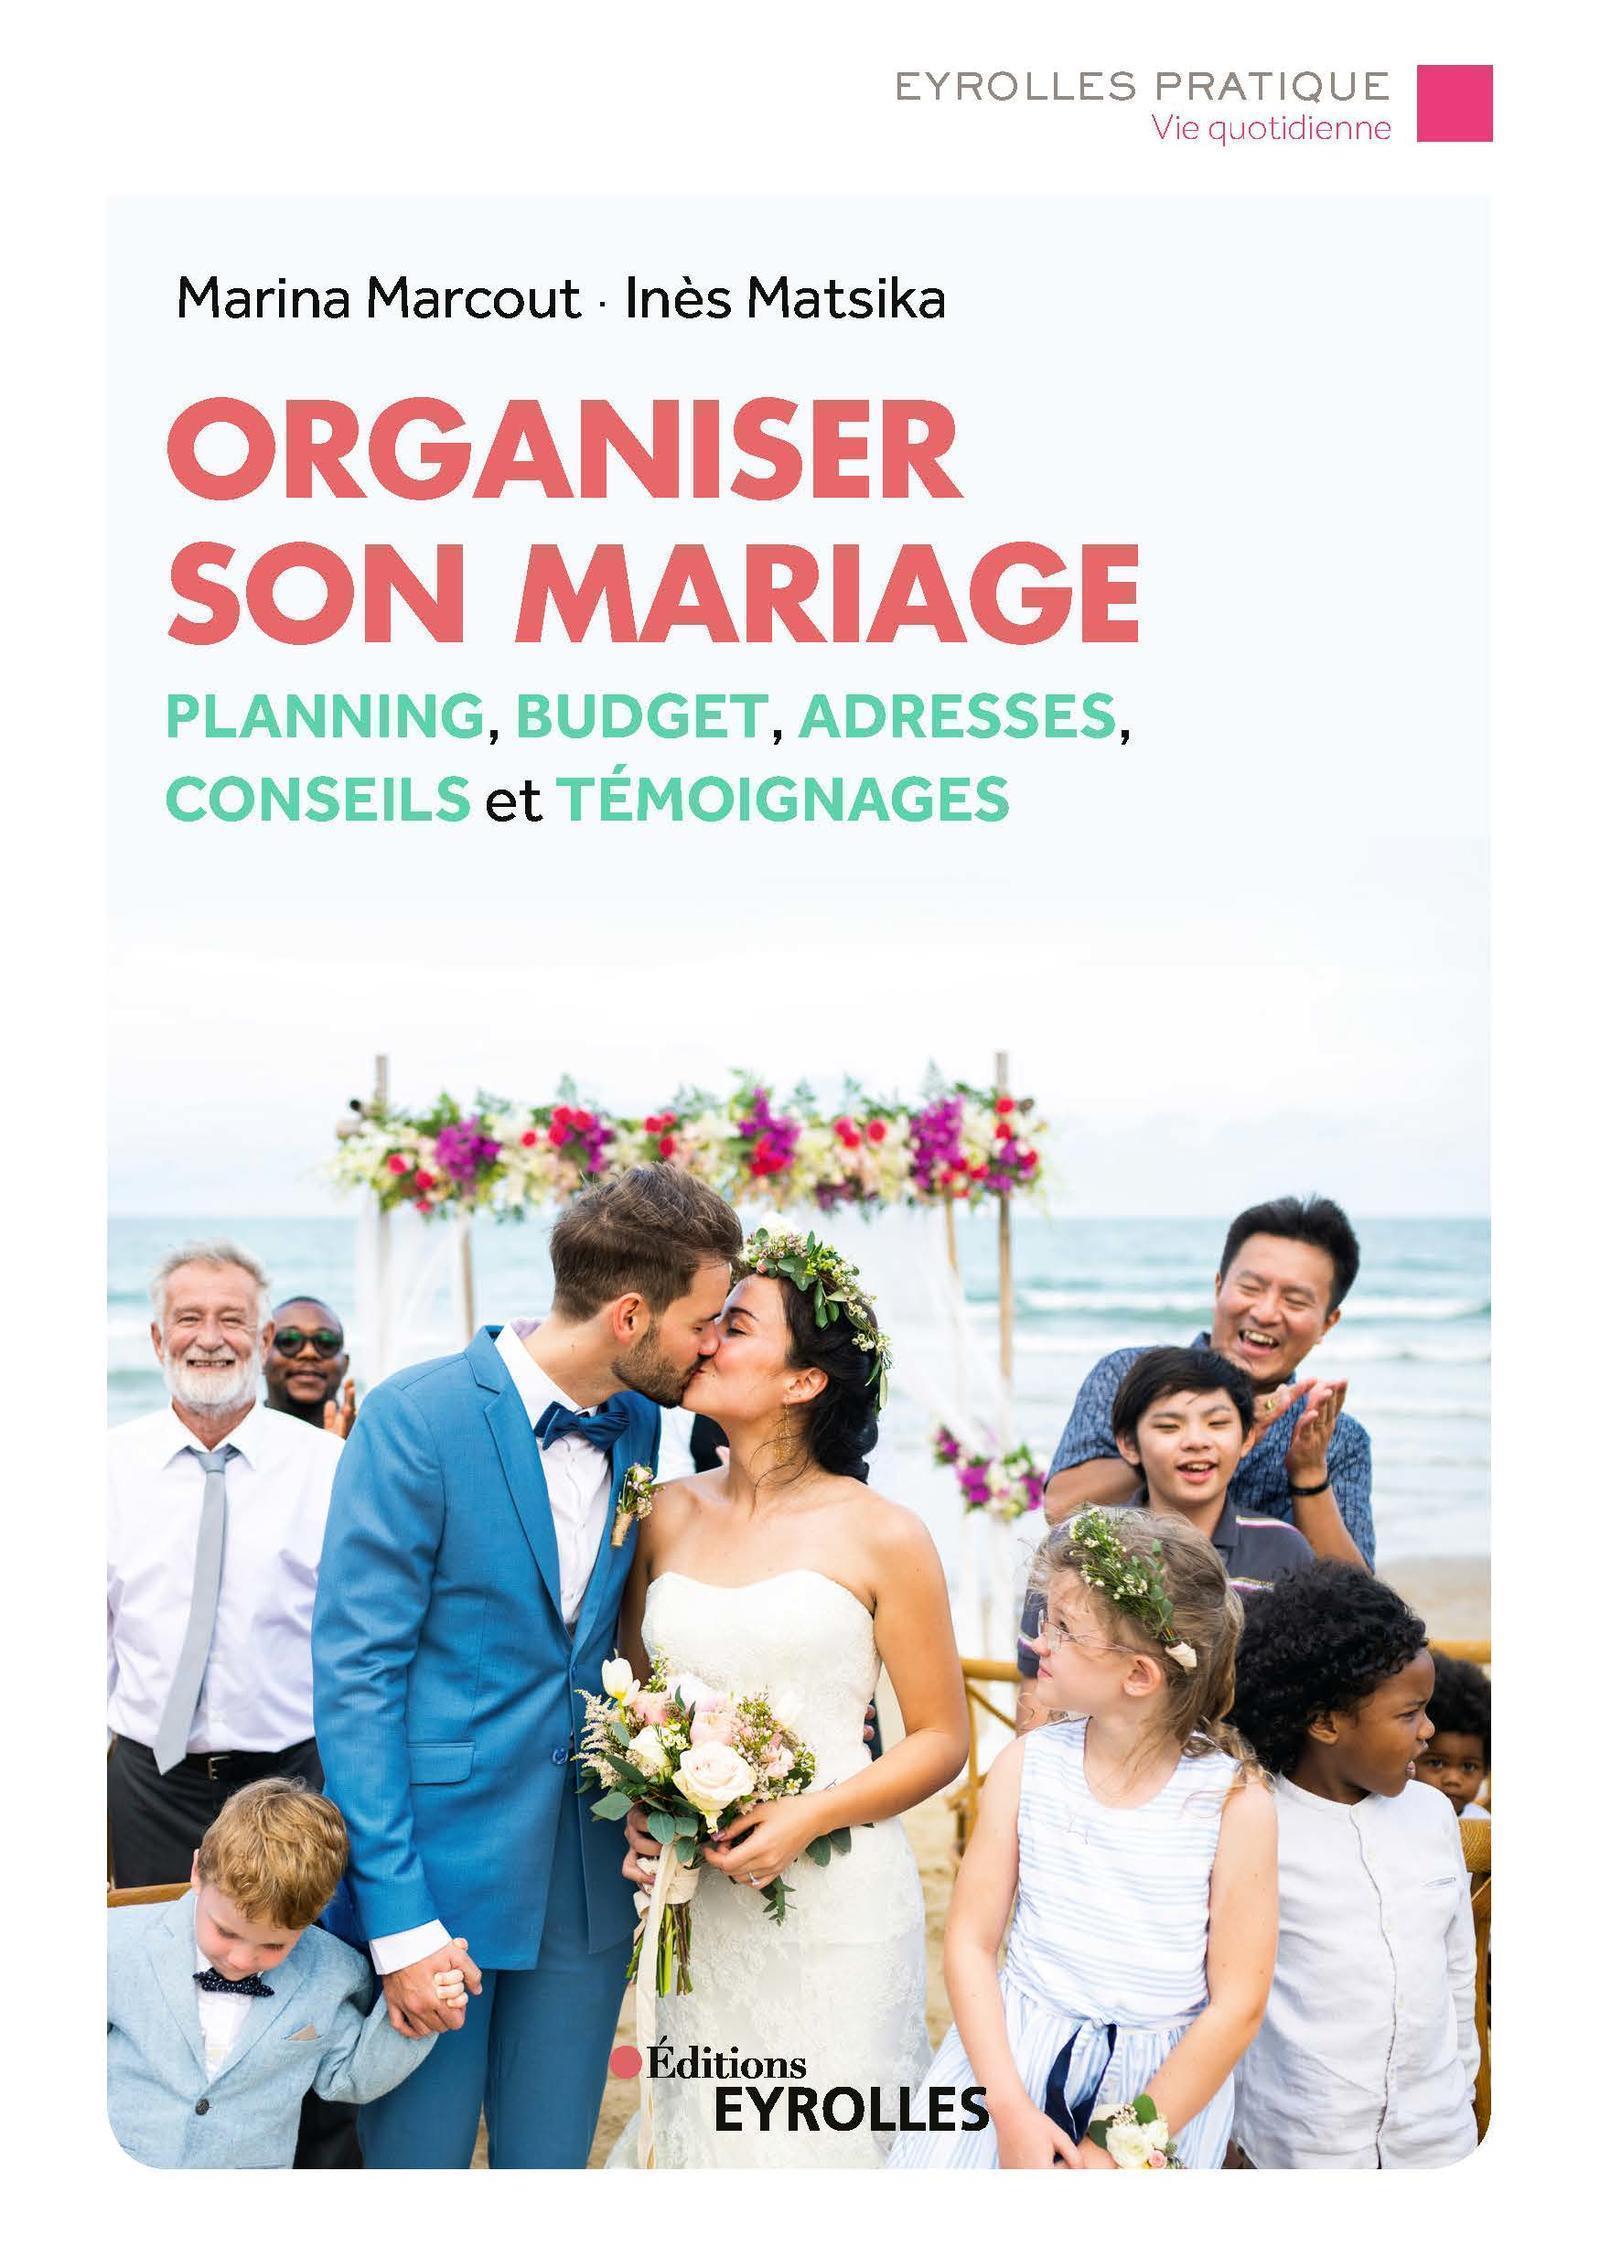 ORGANISER SON MARIAGE - PLANNING  BUDGET  ADRESSES  CONSEILS ET TEMOIGNAGES